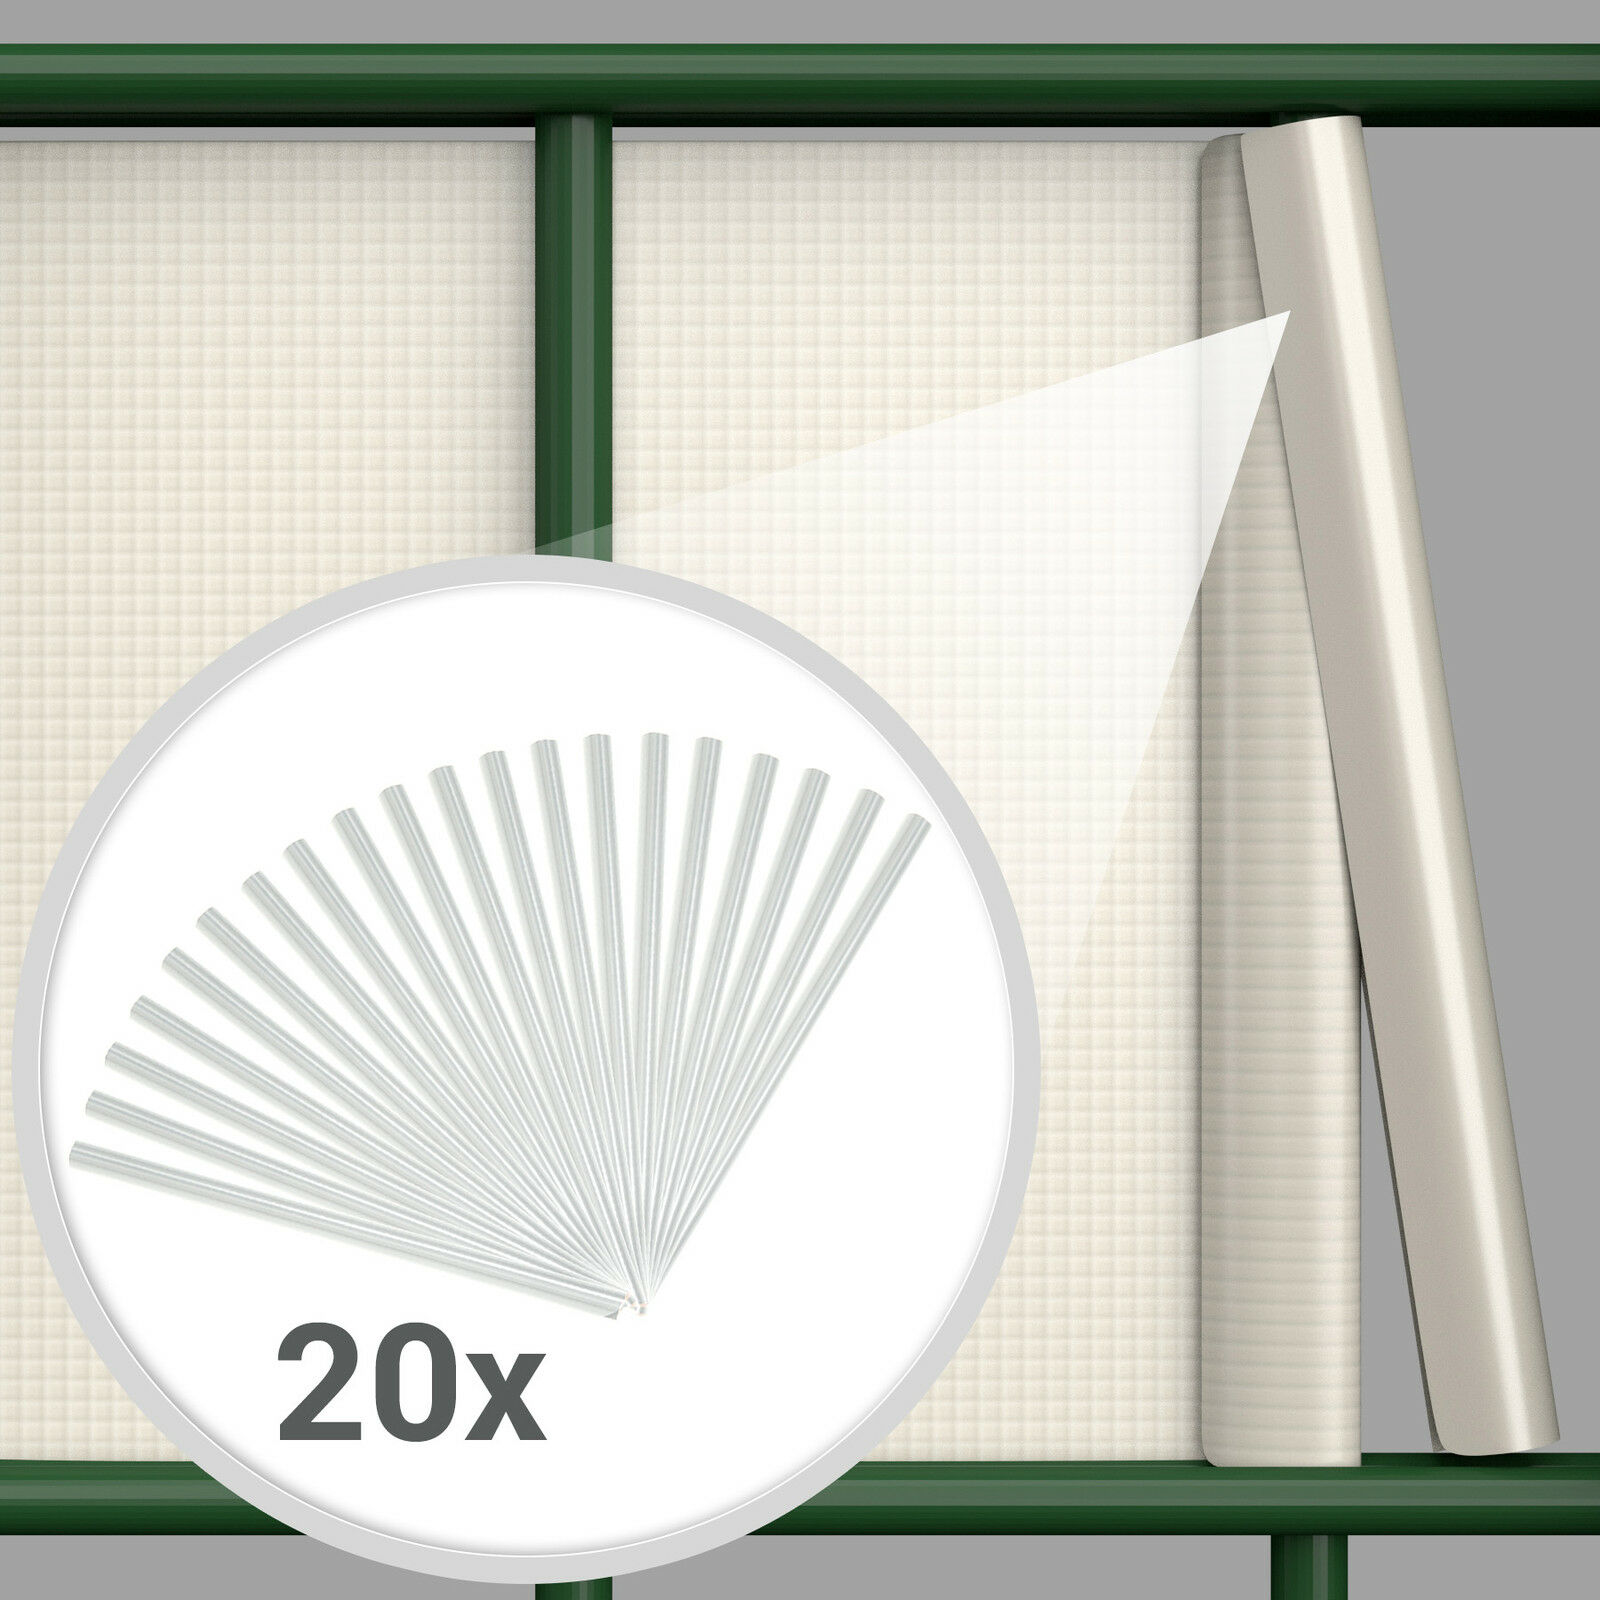 Pvc Sichtschutz Doppelstabmatten : PVC Sichtschutz Streifen Sichtschutzfolie Doppelstabmatten Zaun Schutz